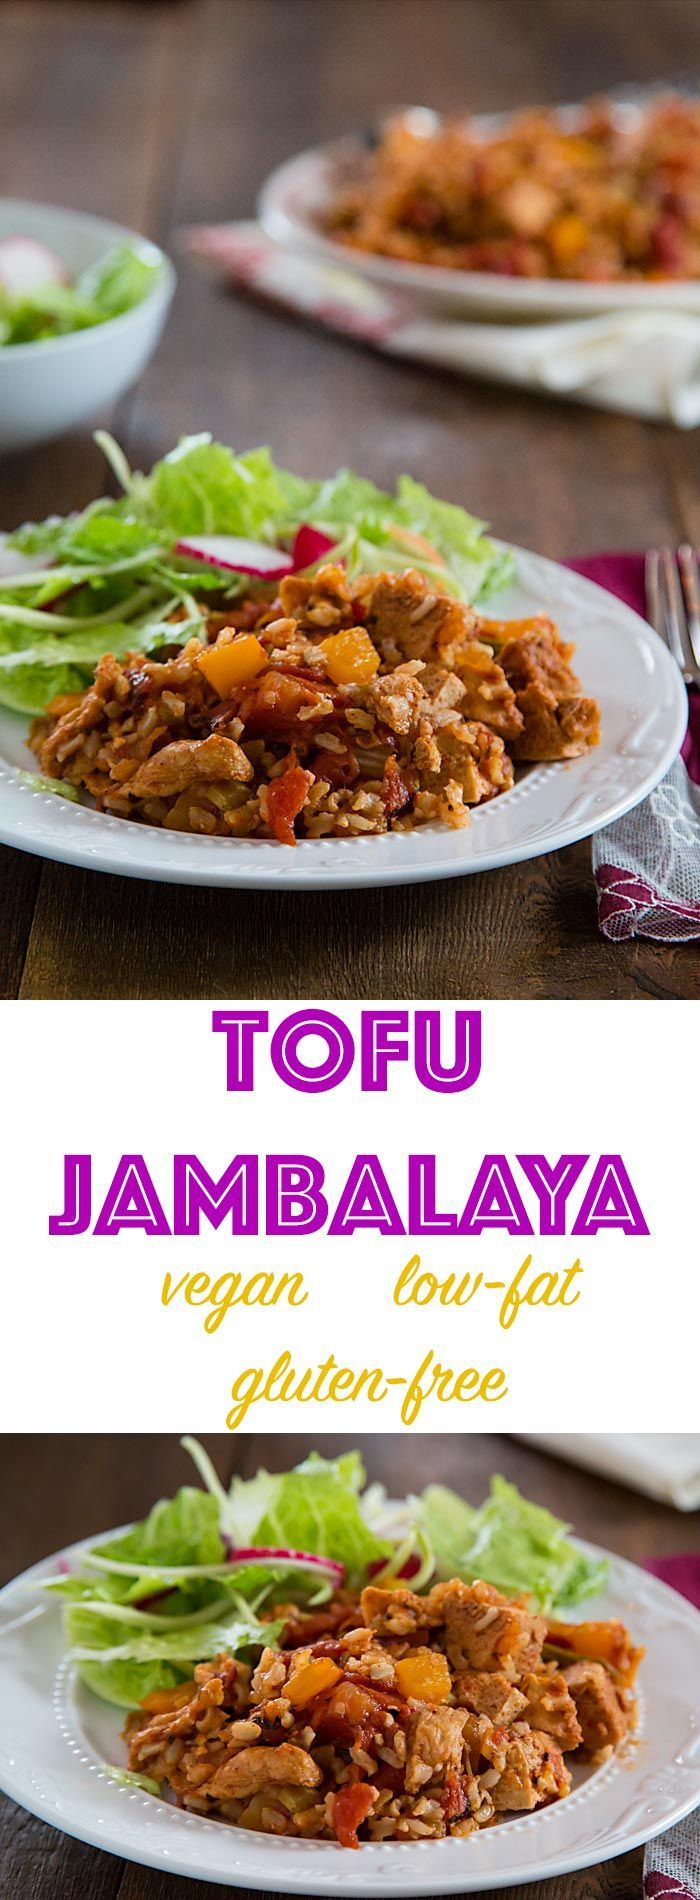 This vegan jambalaya is more like a paella or Spanish rice than a traditional jambalaya. Gluten-free and low-fat!